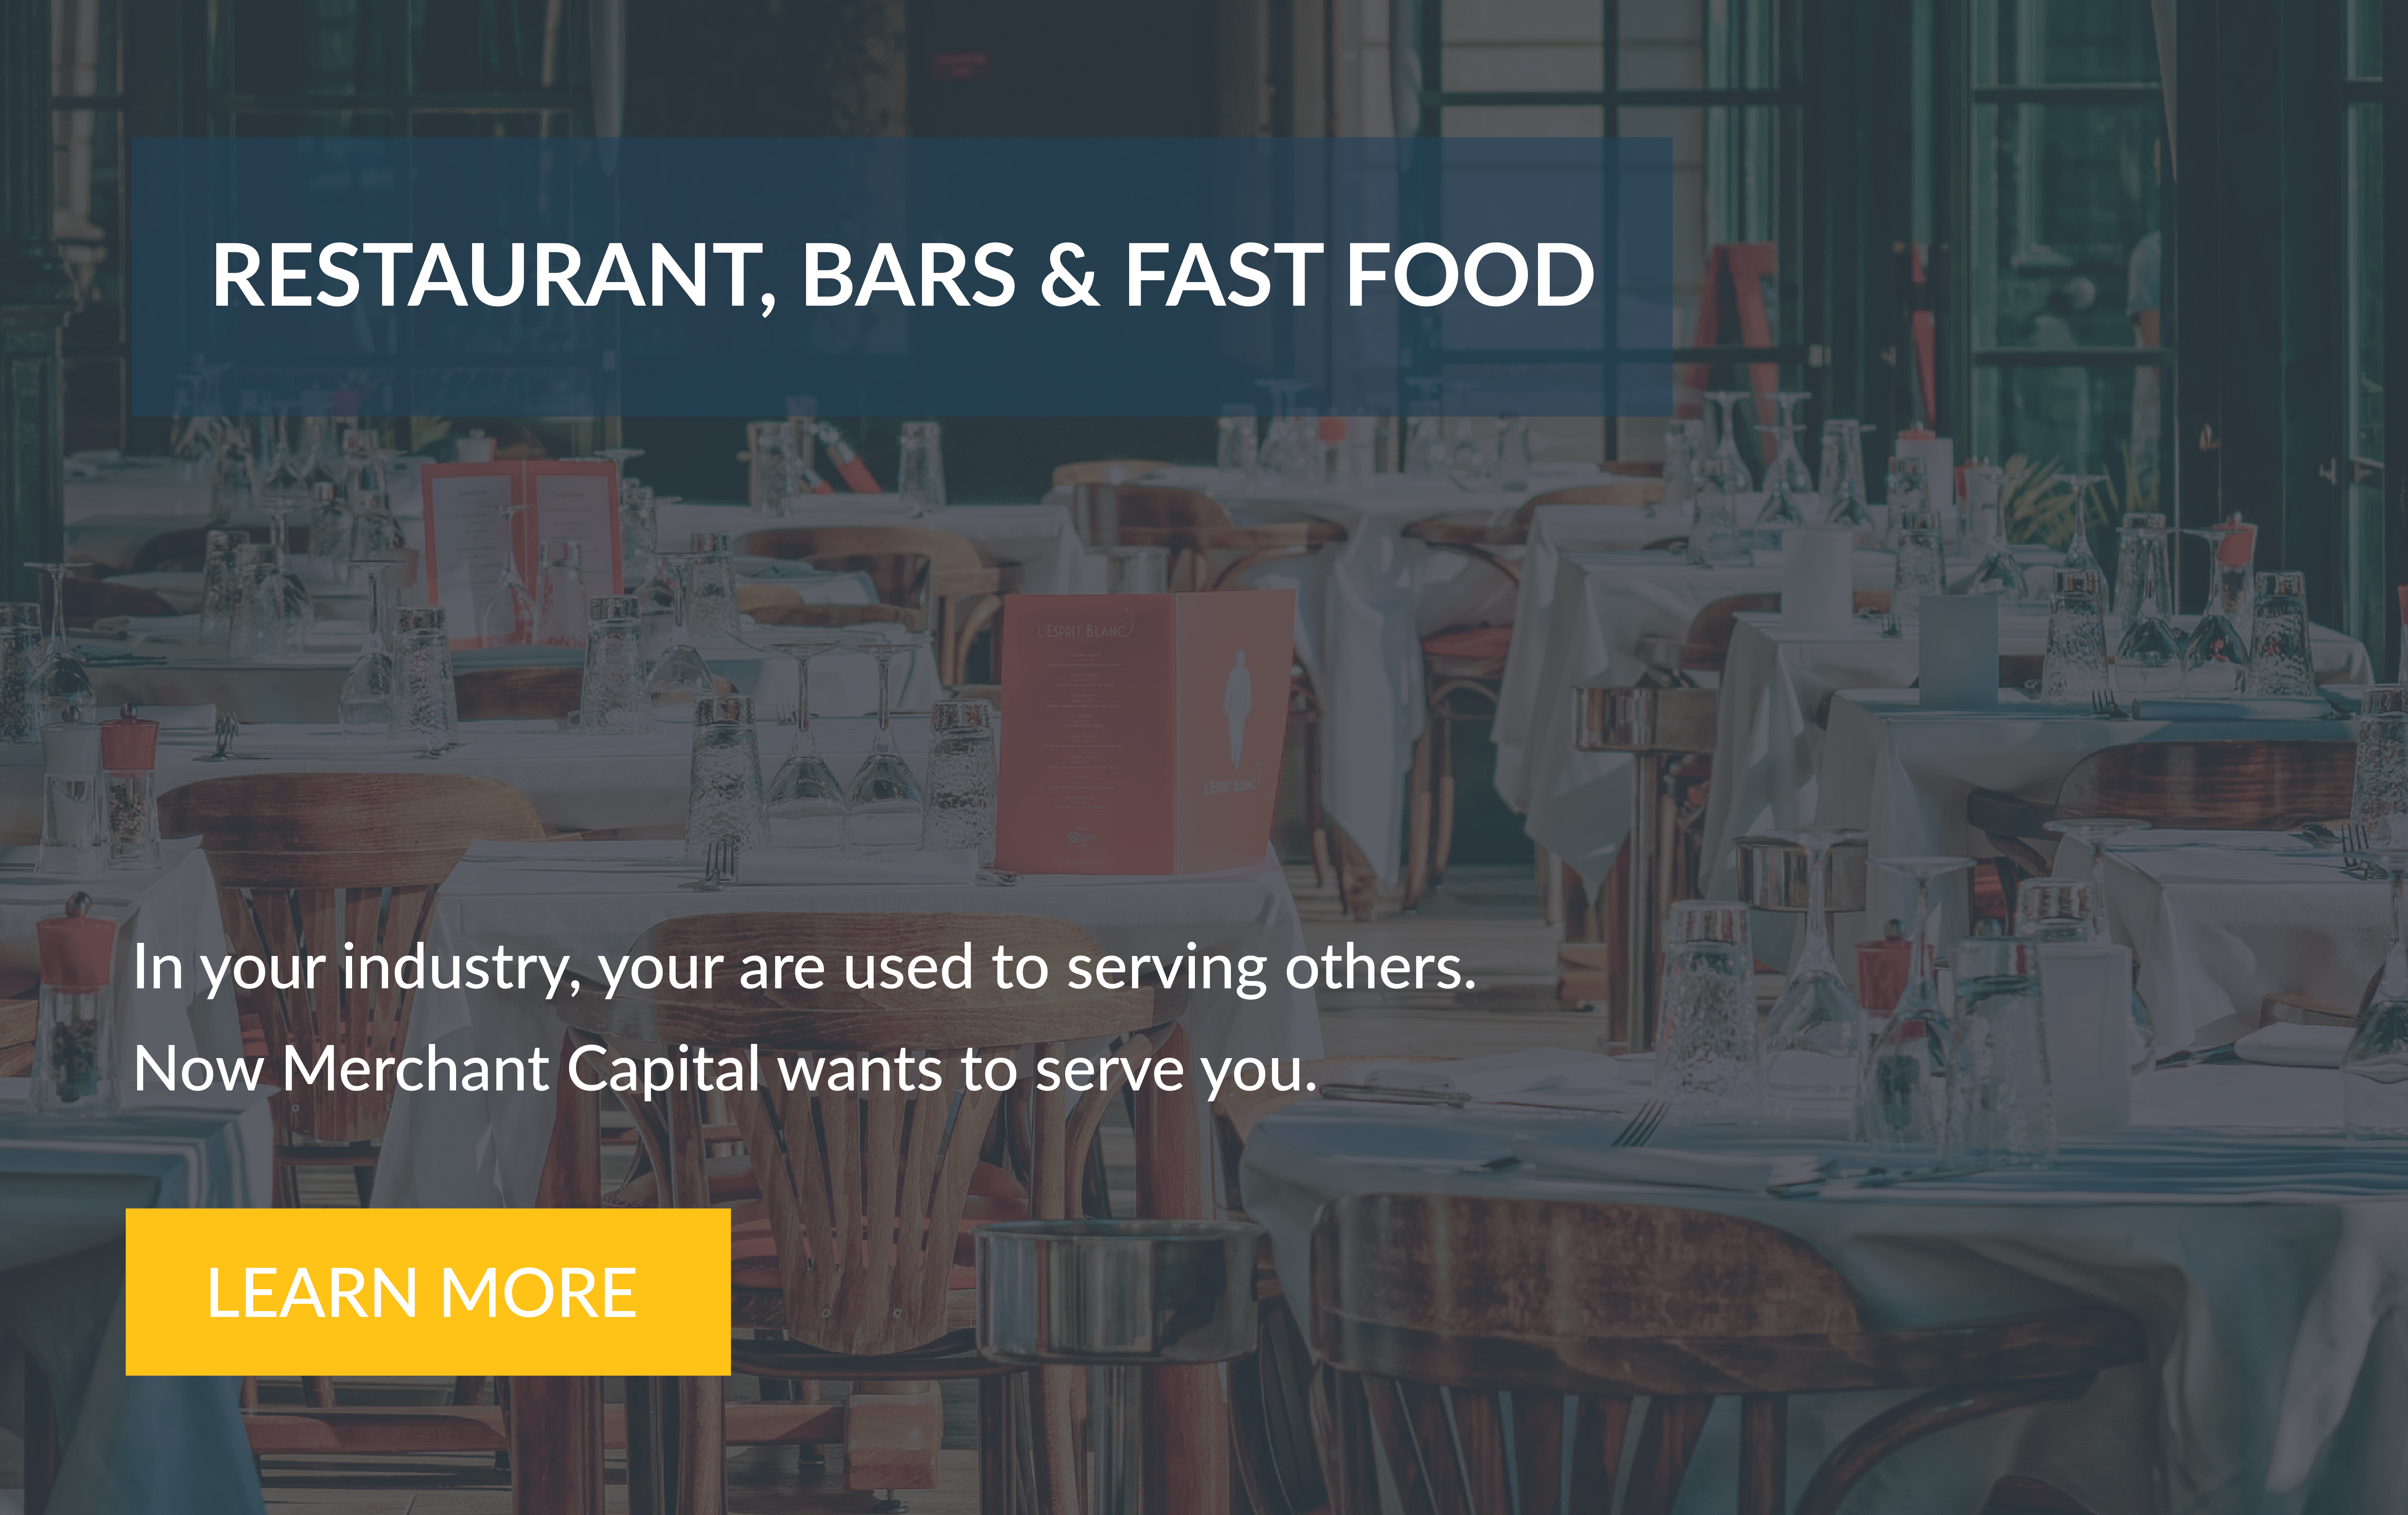 RESTAURANT BARS & FAST FOOD